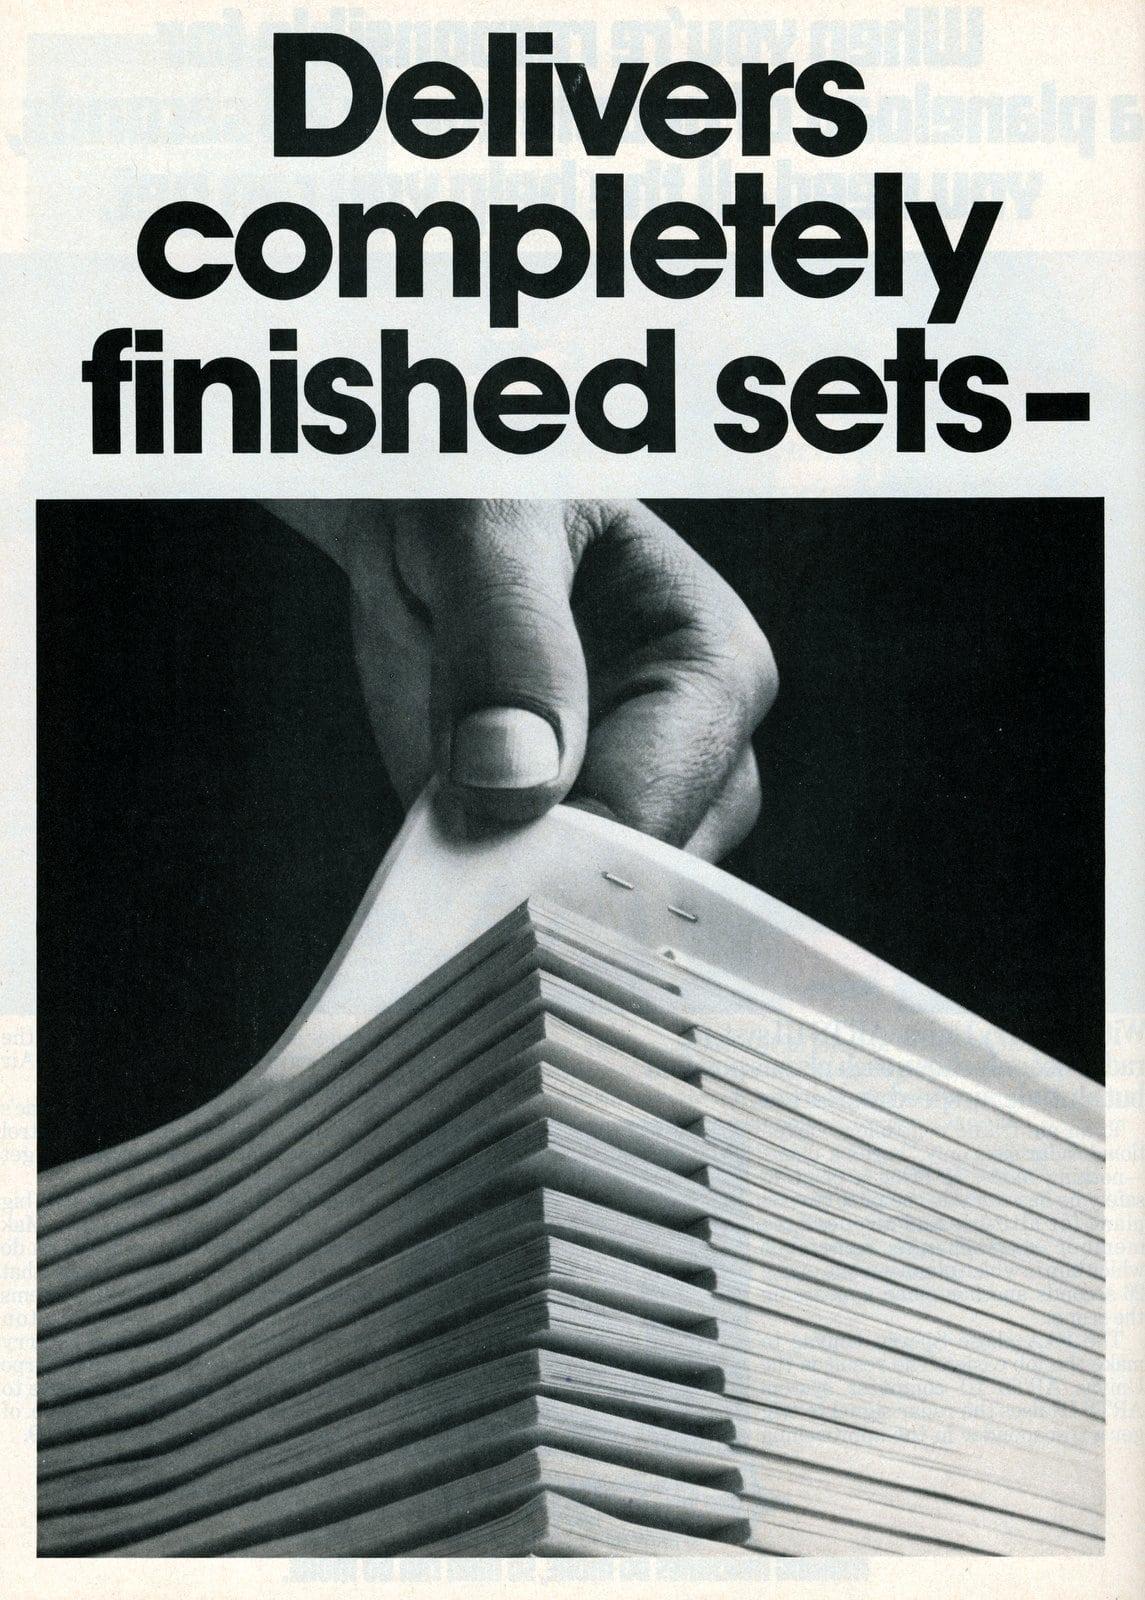 Kodak Ektaprint AF copier-duplicators (1976)